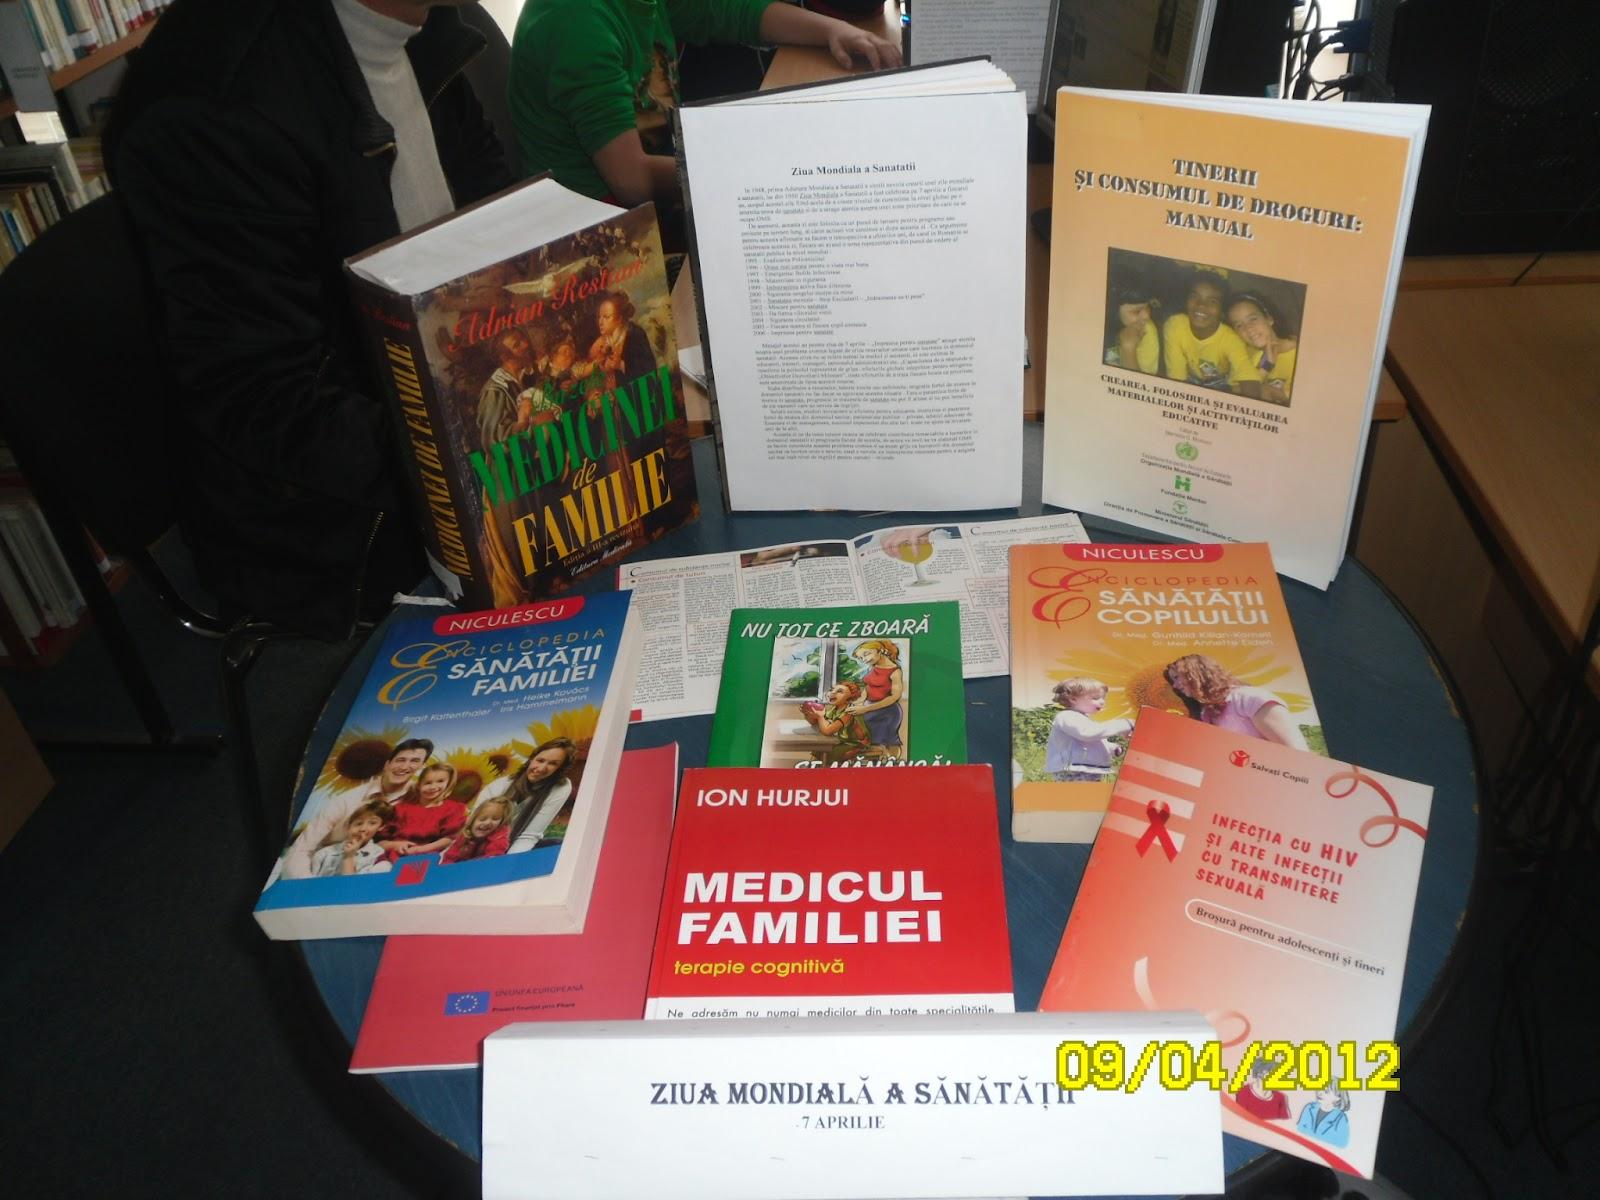 ziua mondiala a sanatatii (10)  |Ziua Mondiala A Sanatatii